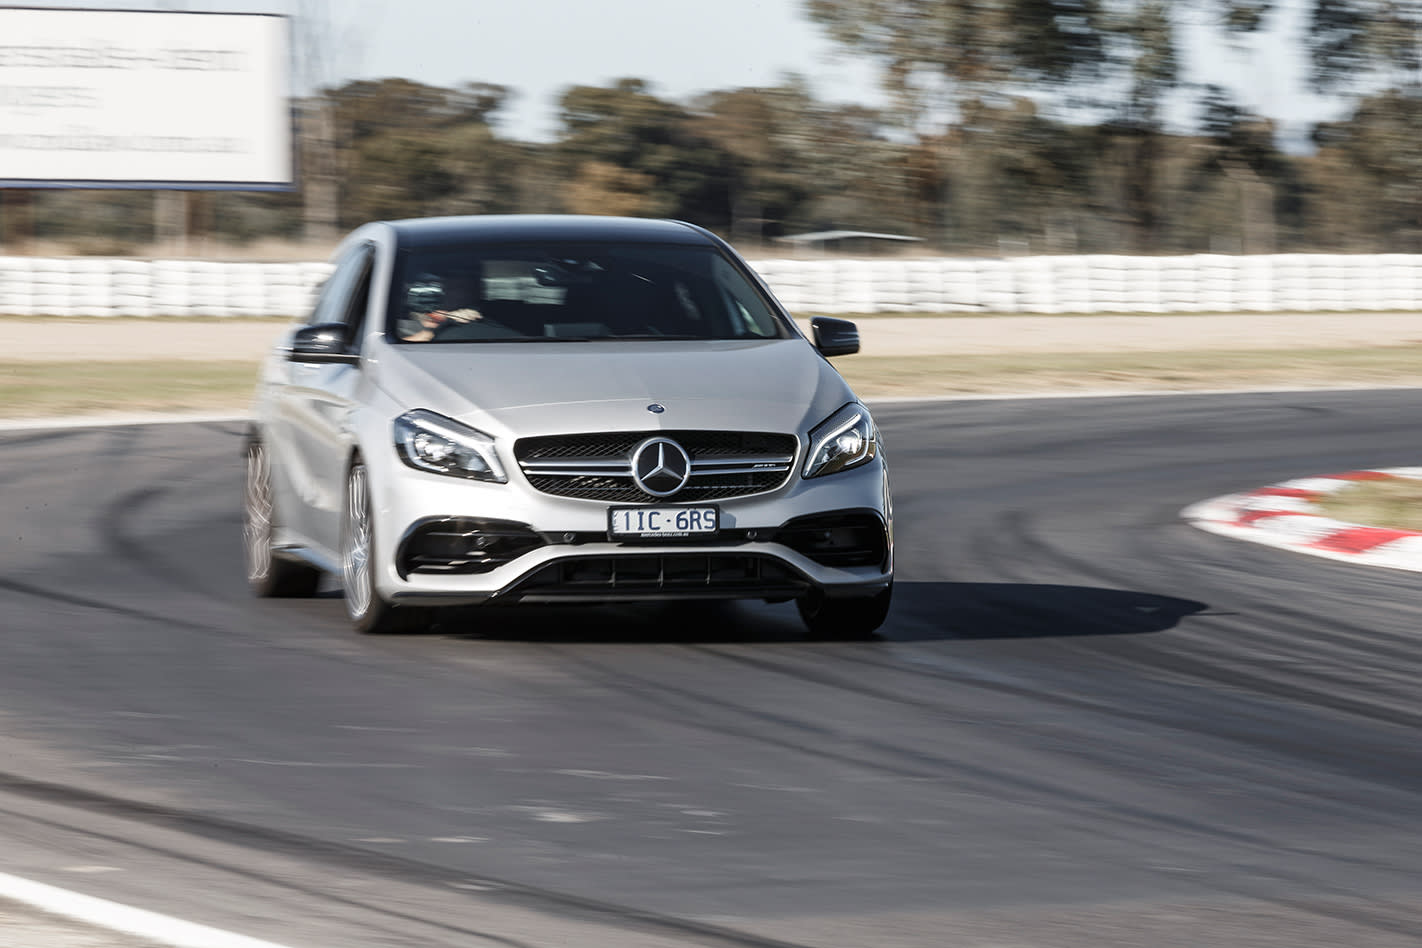 2017 Mercedes AMG A45 front.jpg